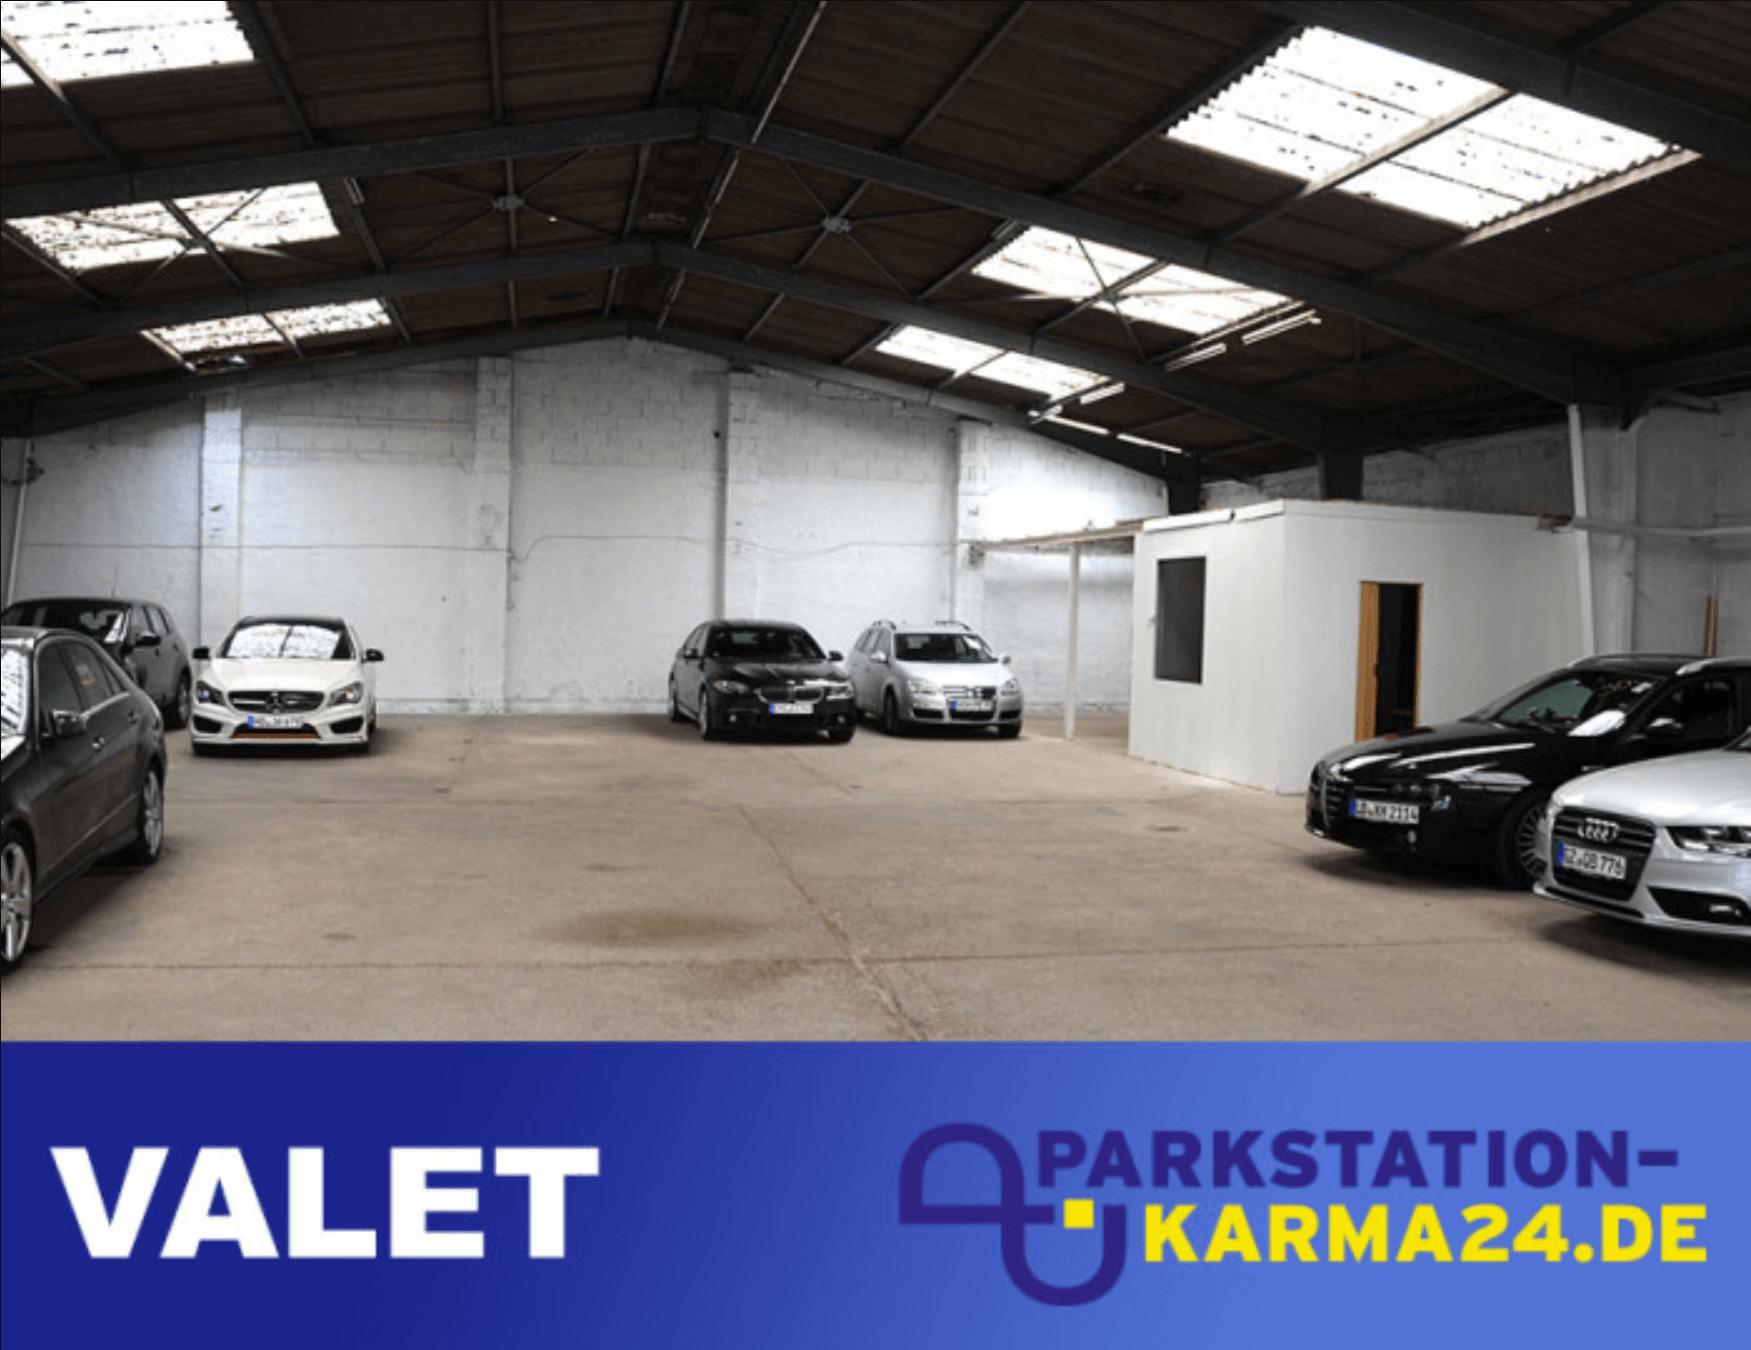 Parkstation-Karma24.de bei Valet Parking Frankfurt